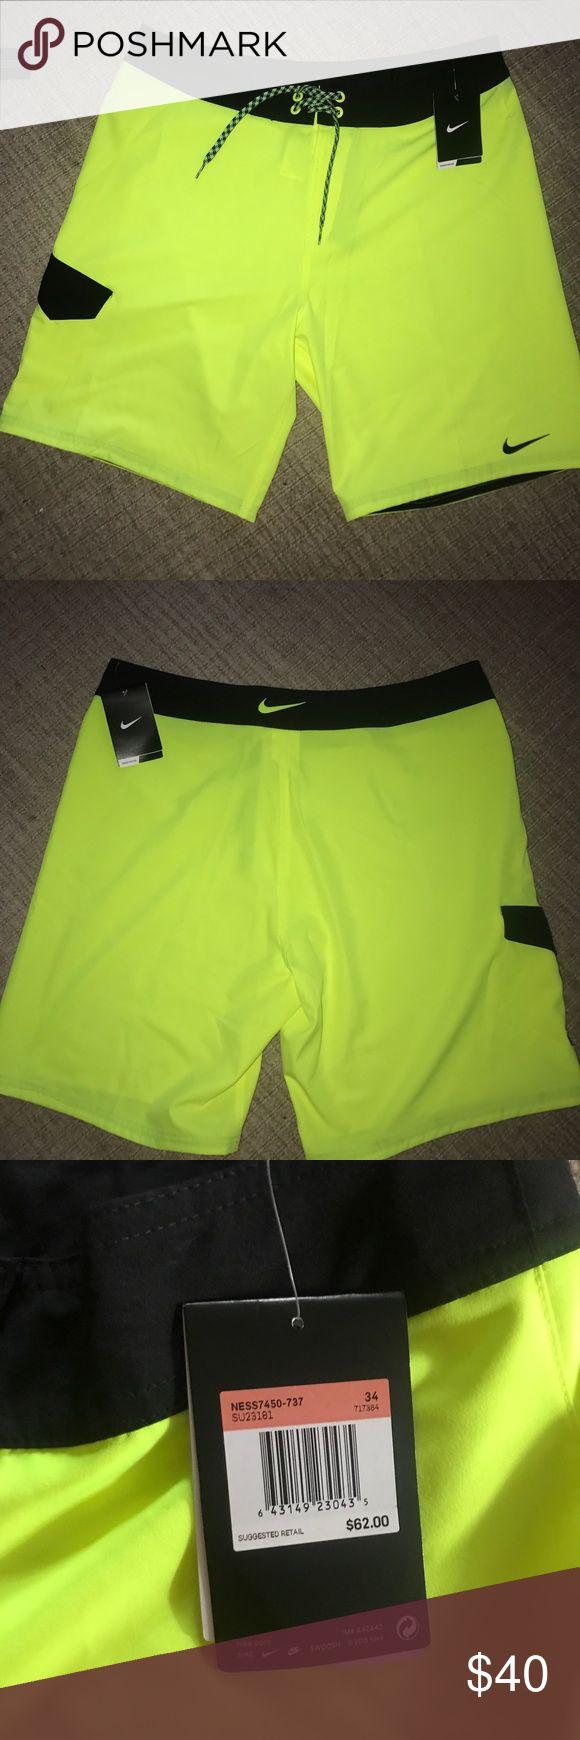 Nike Men's Swimsuit Nike Men's Swimsuit; yellow; (H2) 🌸 Nike Swim